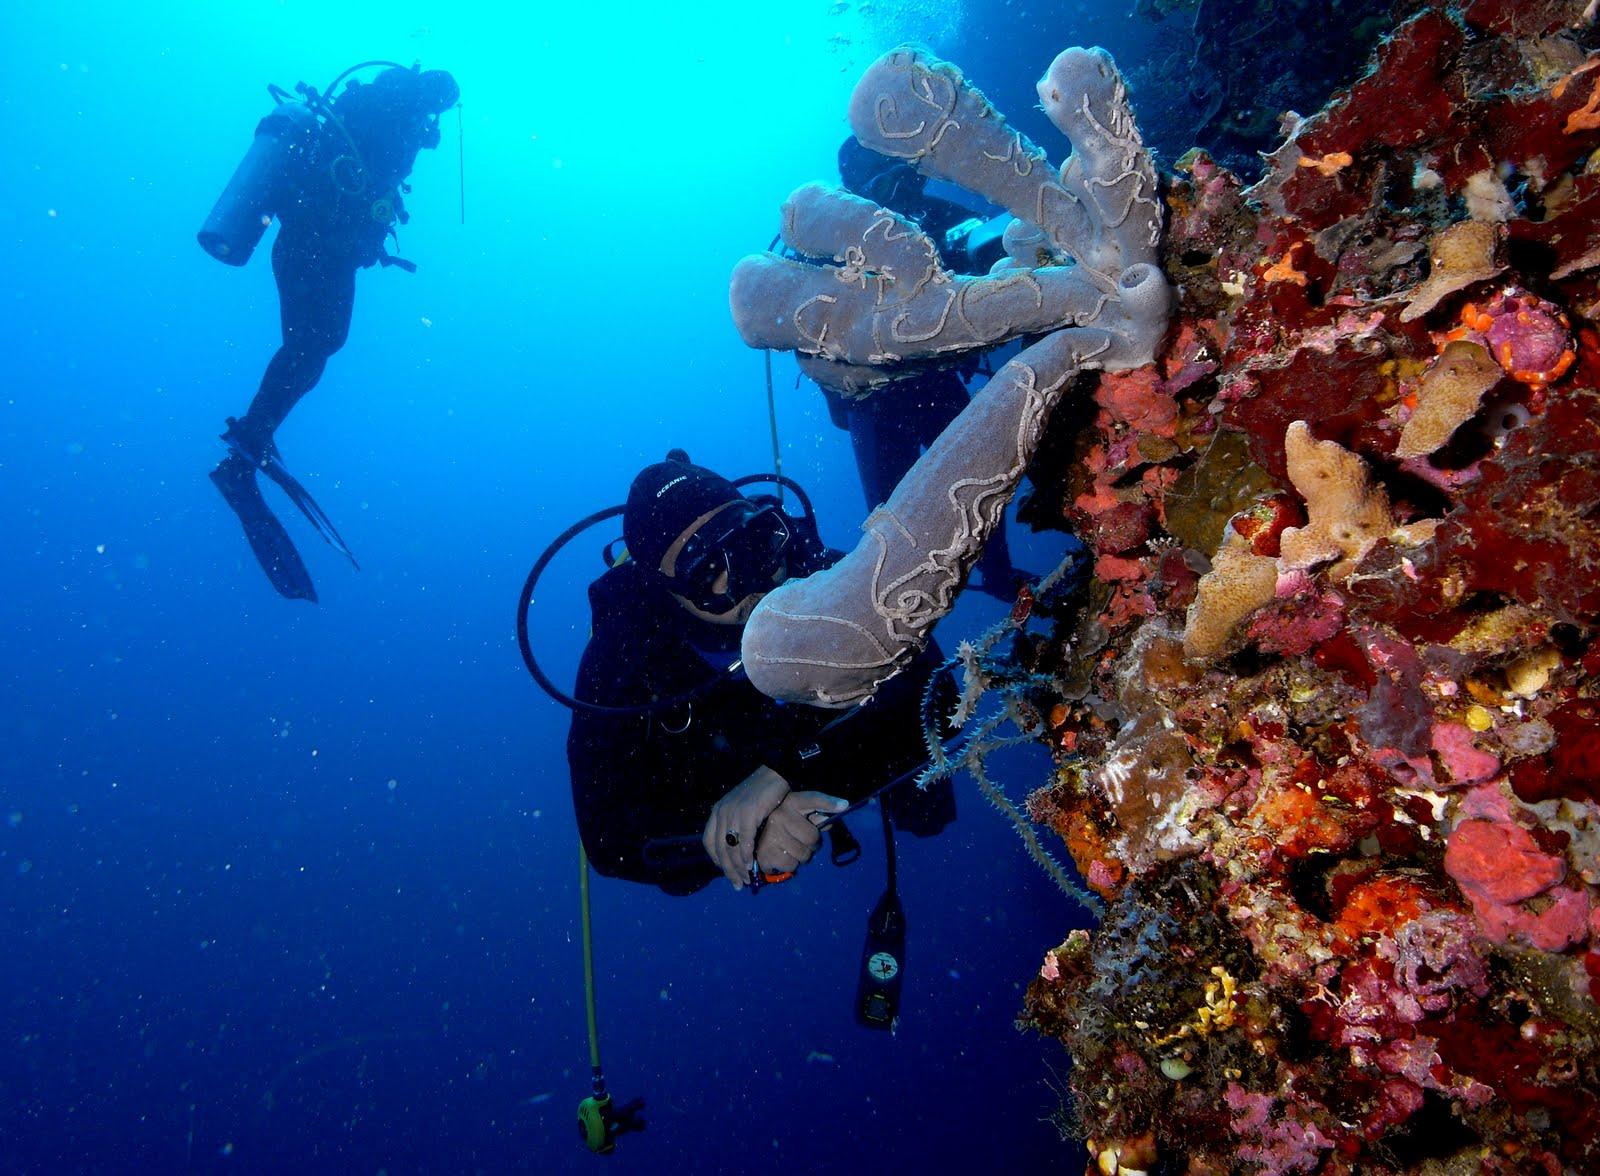 Keindahan Bawah Laut Gorontalo Taman Wisata Olele Kab Bone Bolango